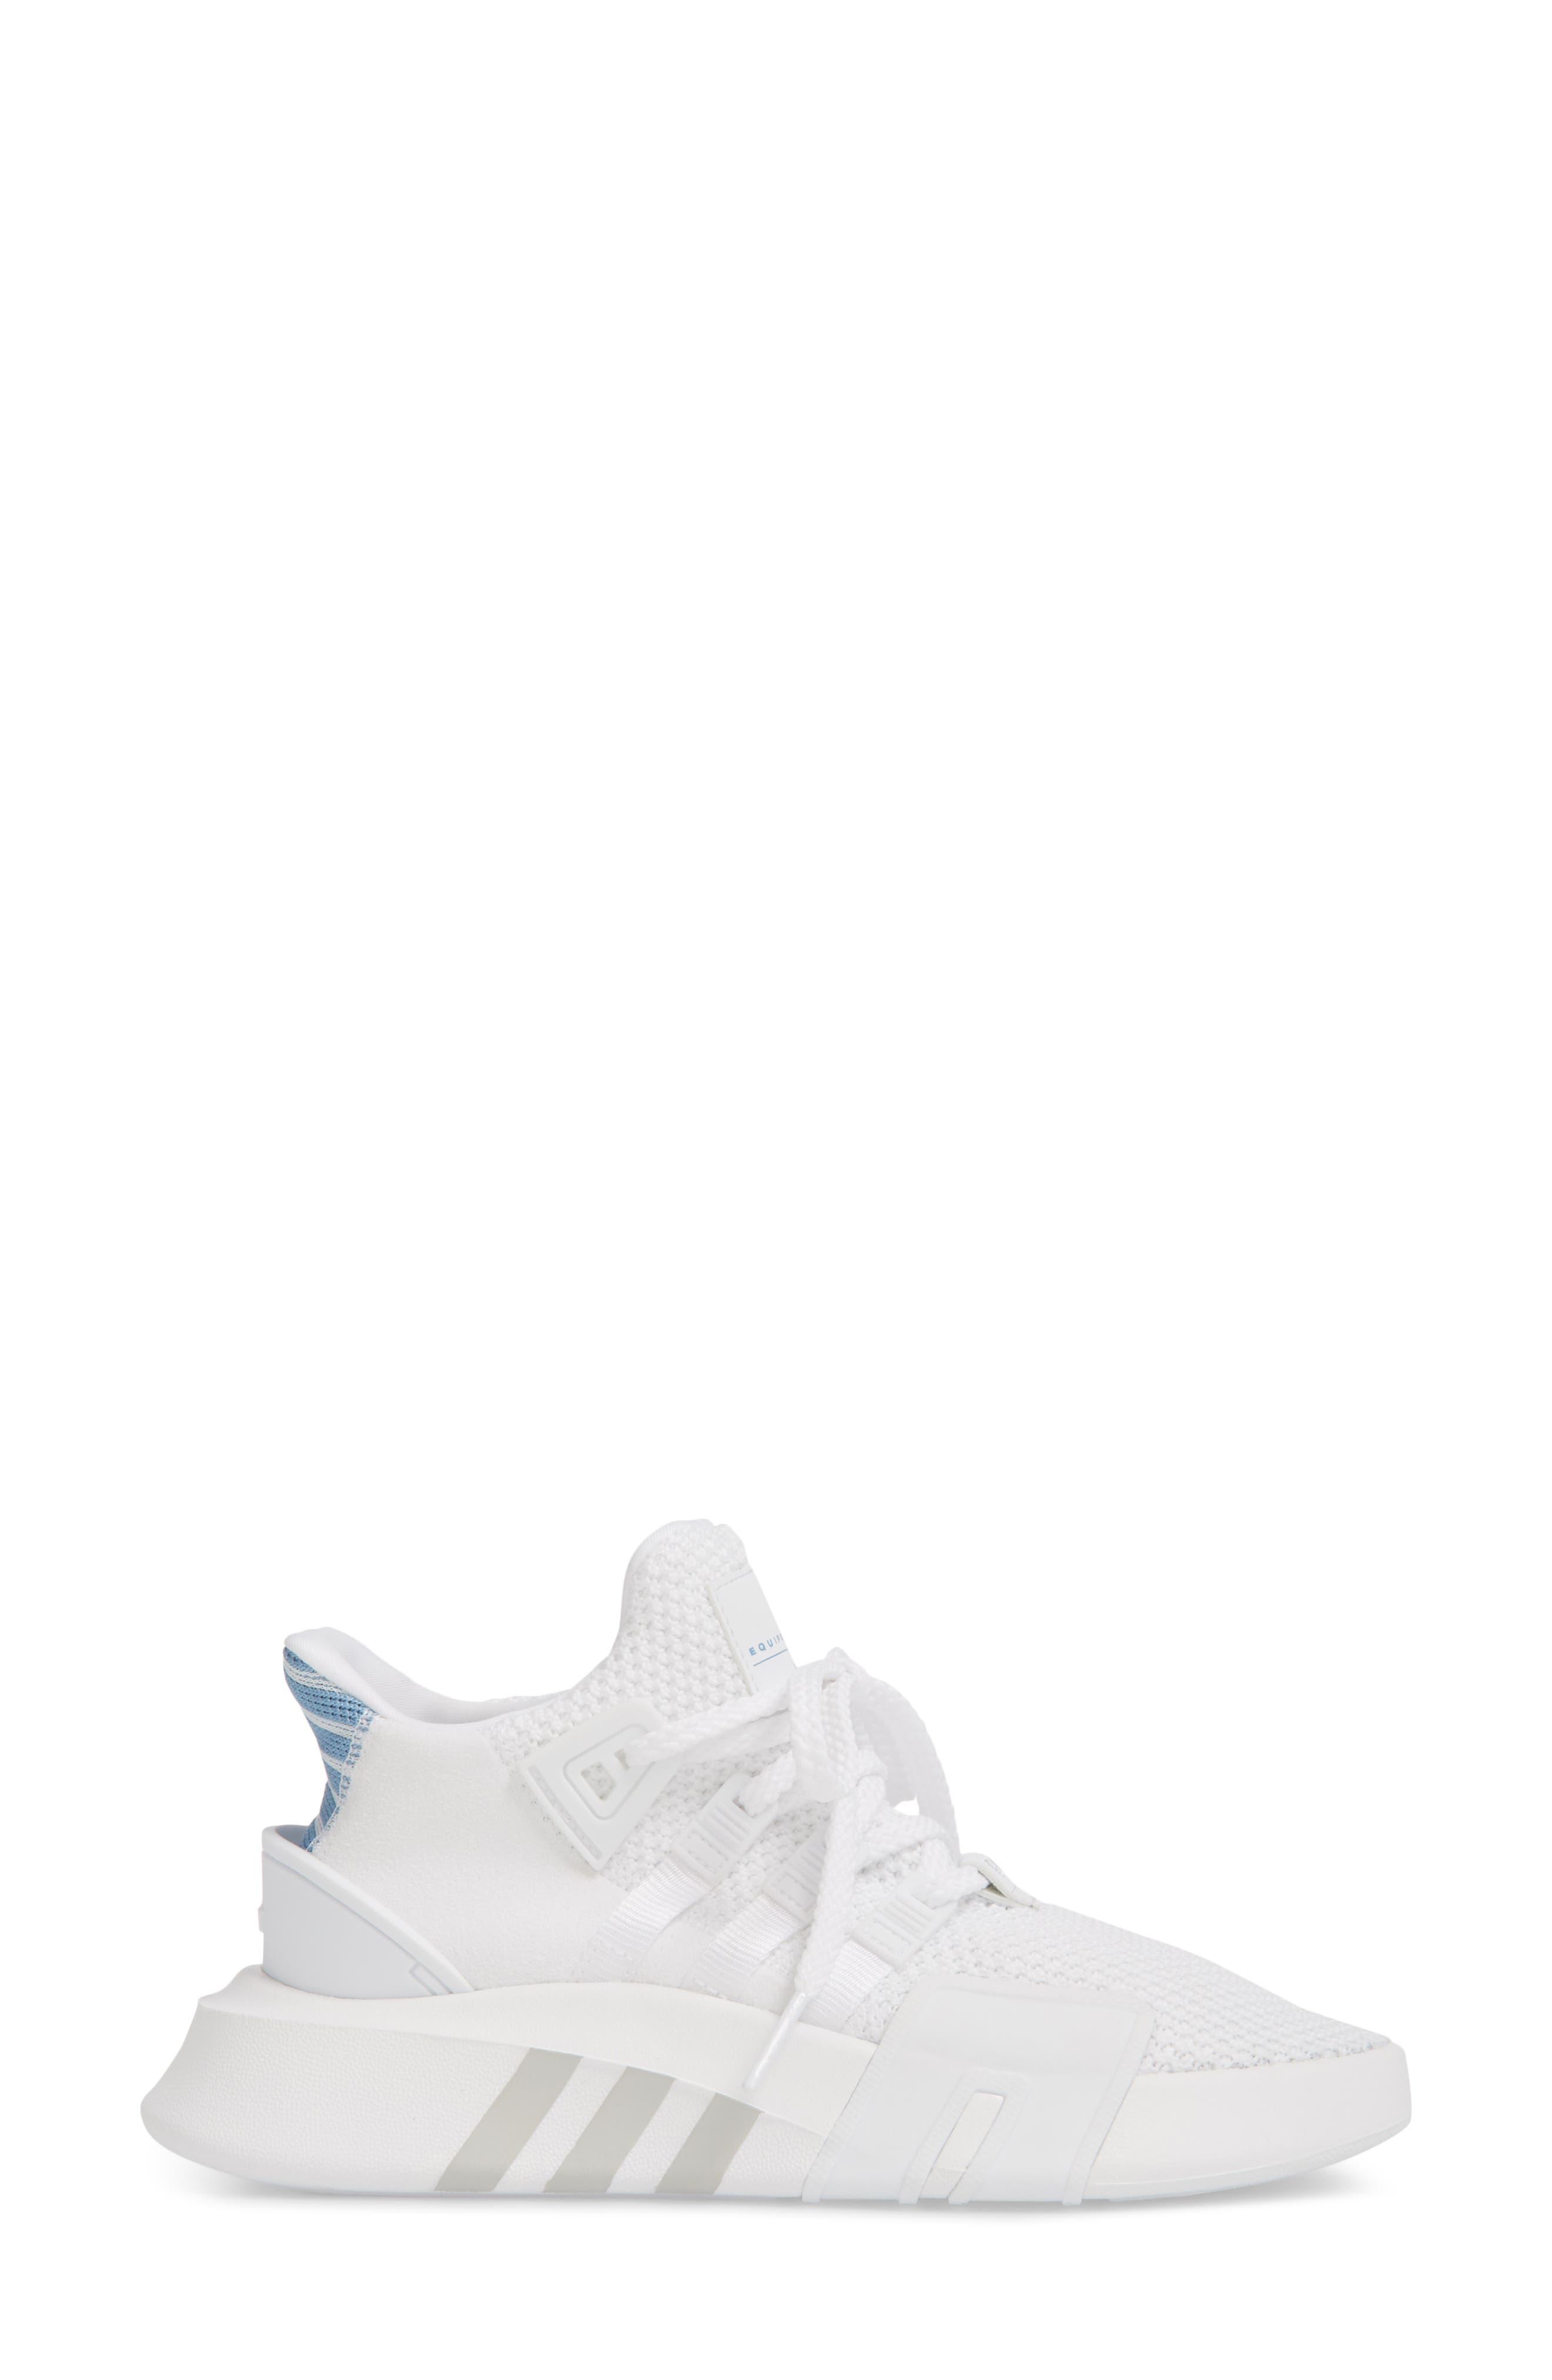 EQT Basketball ADV Sneaker,                             Alternate thumbnail 3, color,                             White/ White/ Ash Blue